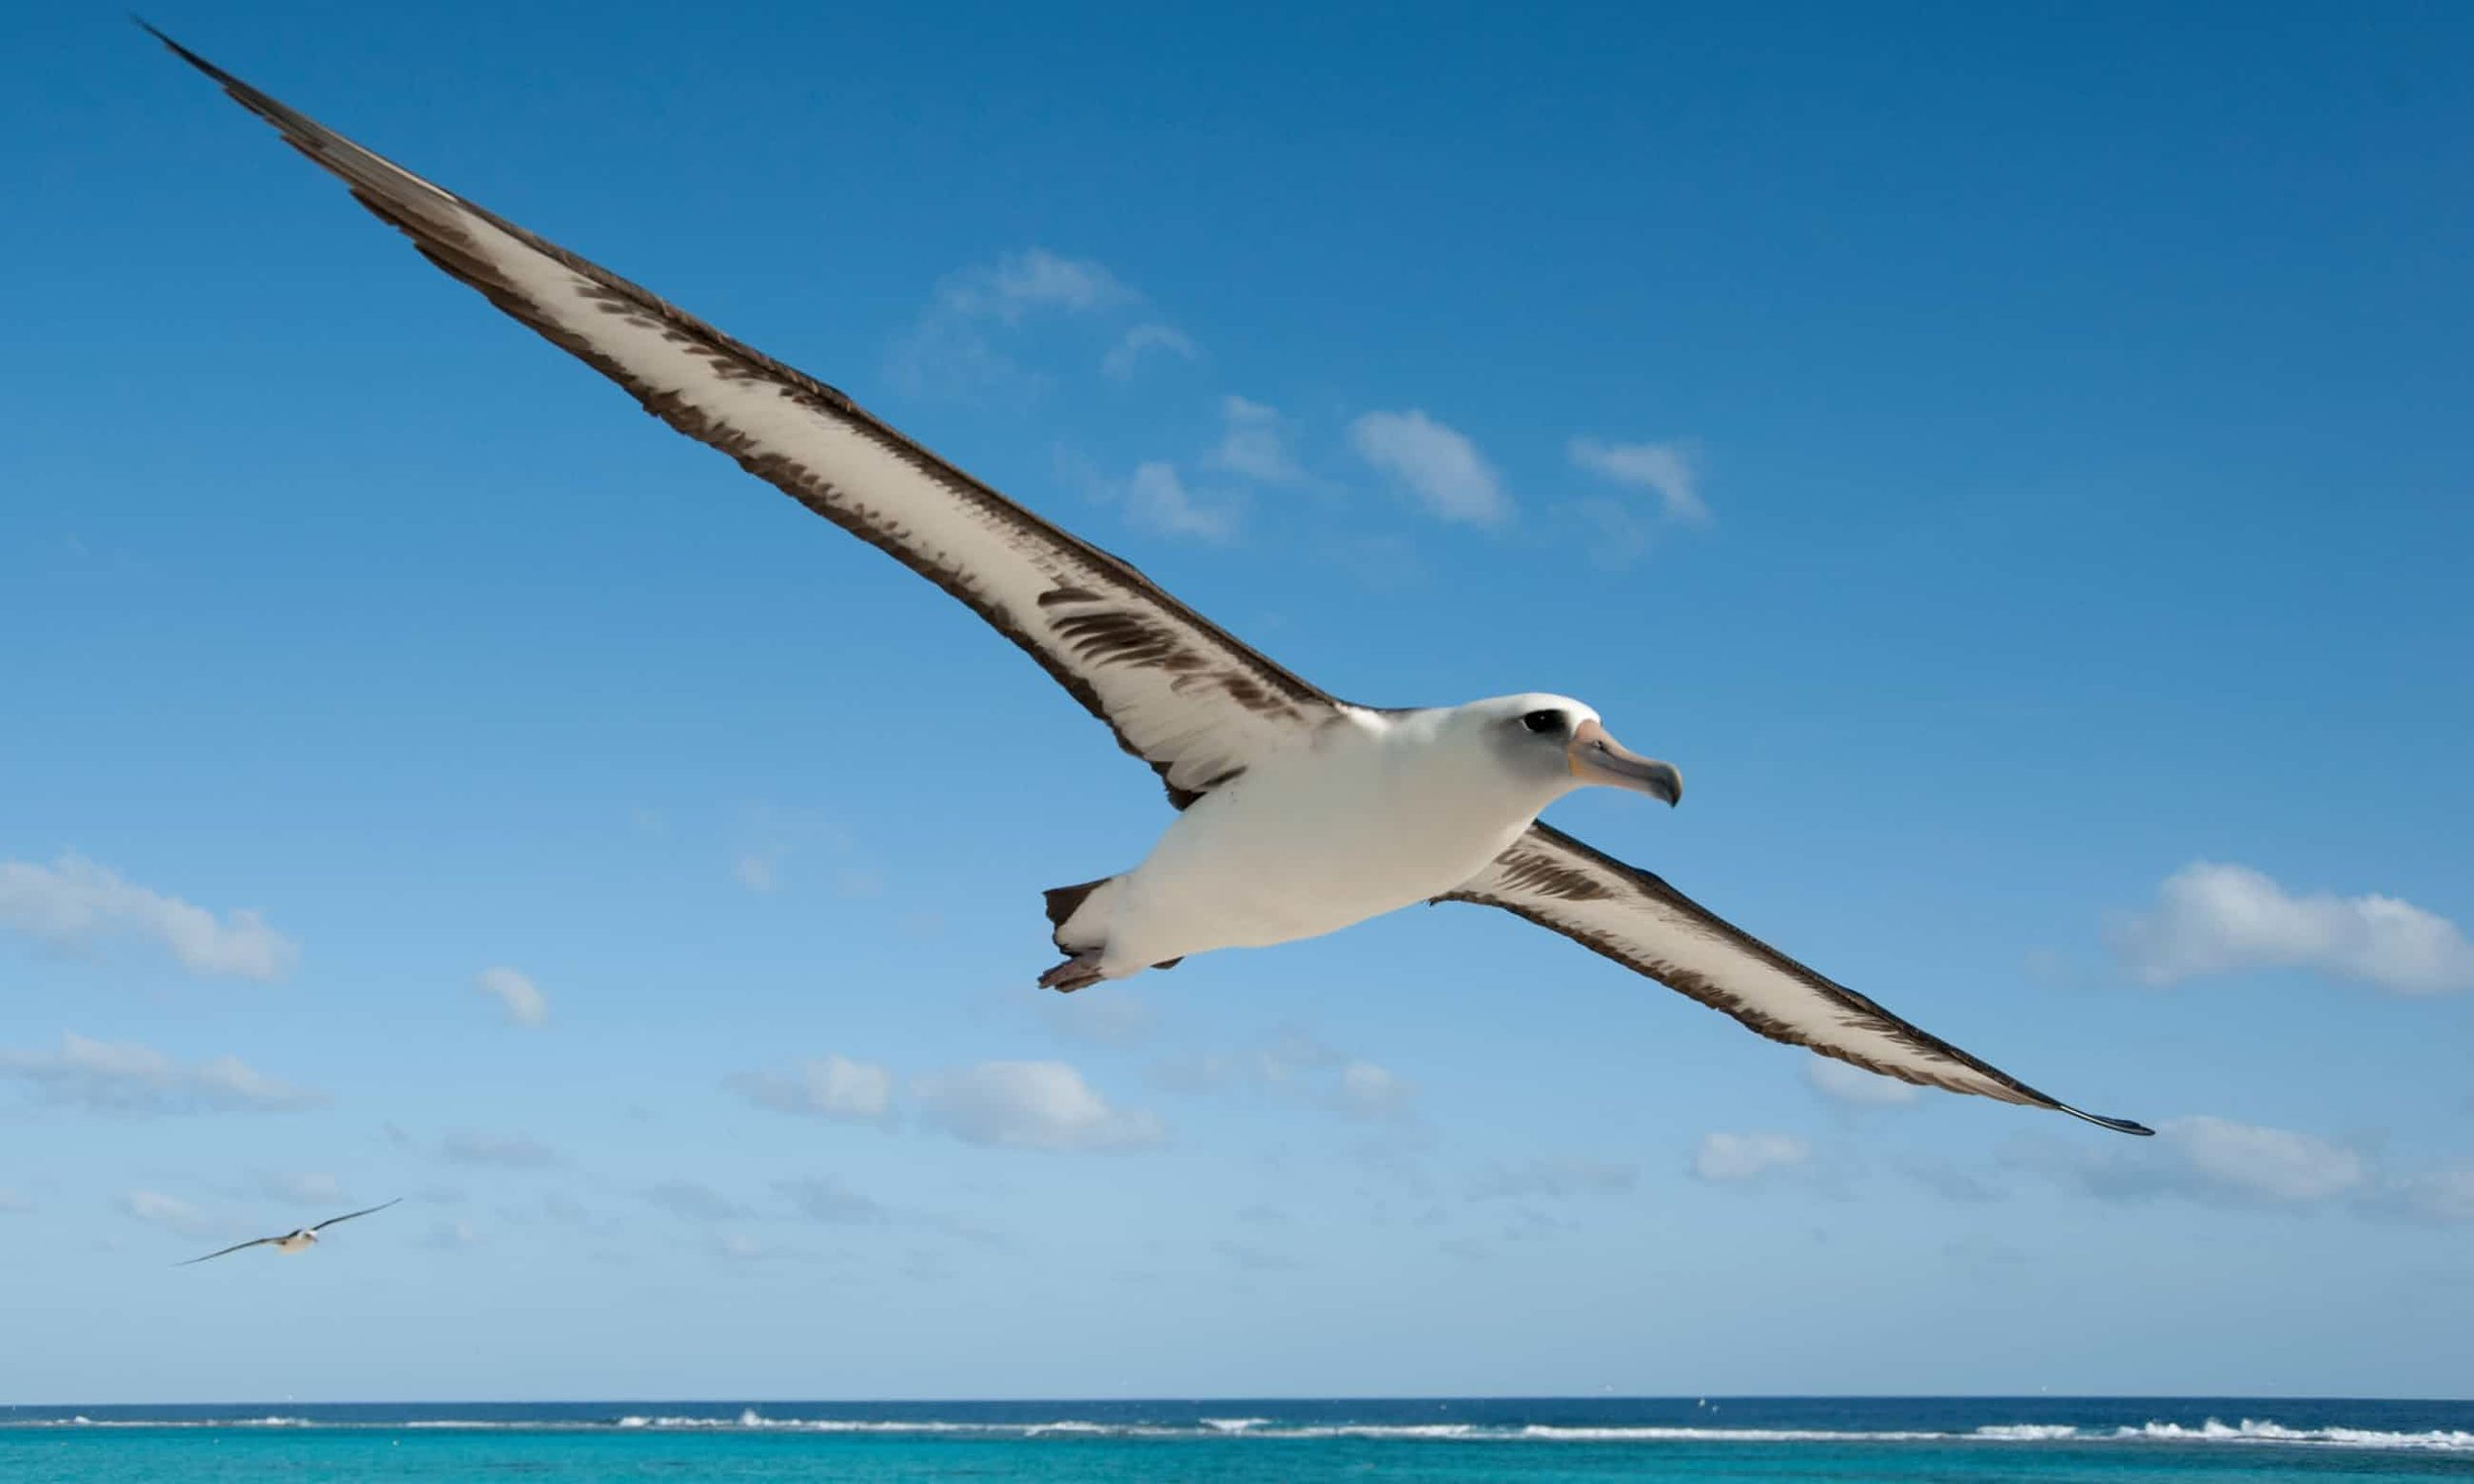 Albatross ... 'They are loving, sensitive and graceful,' says Jordan. Photograph: Chris Jordan